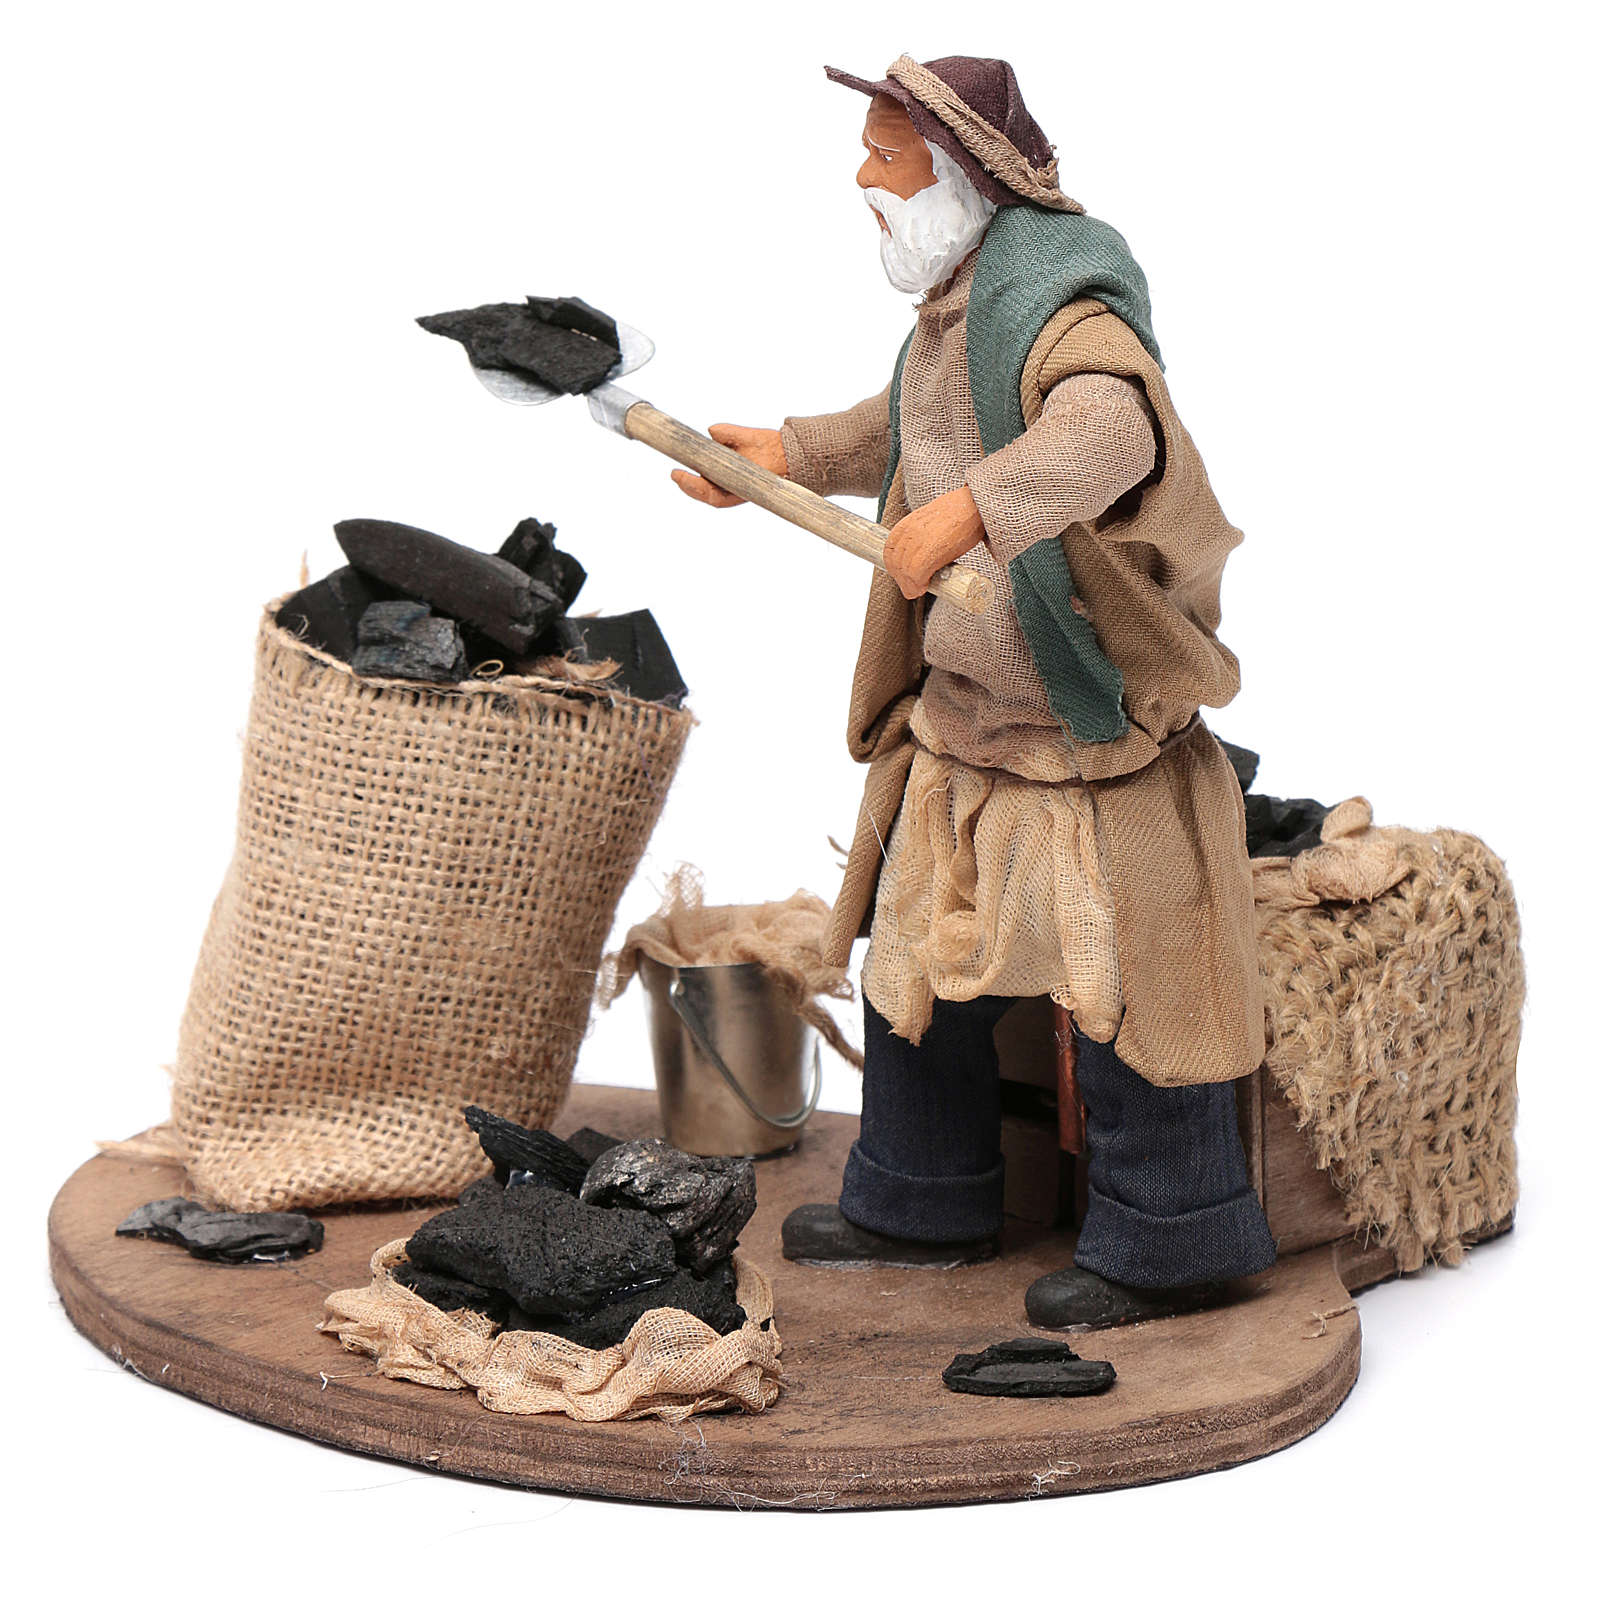 Animated nativity scene figurine, coalman 14cm 4